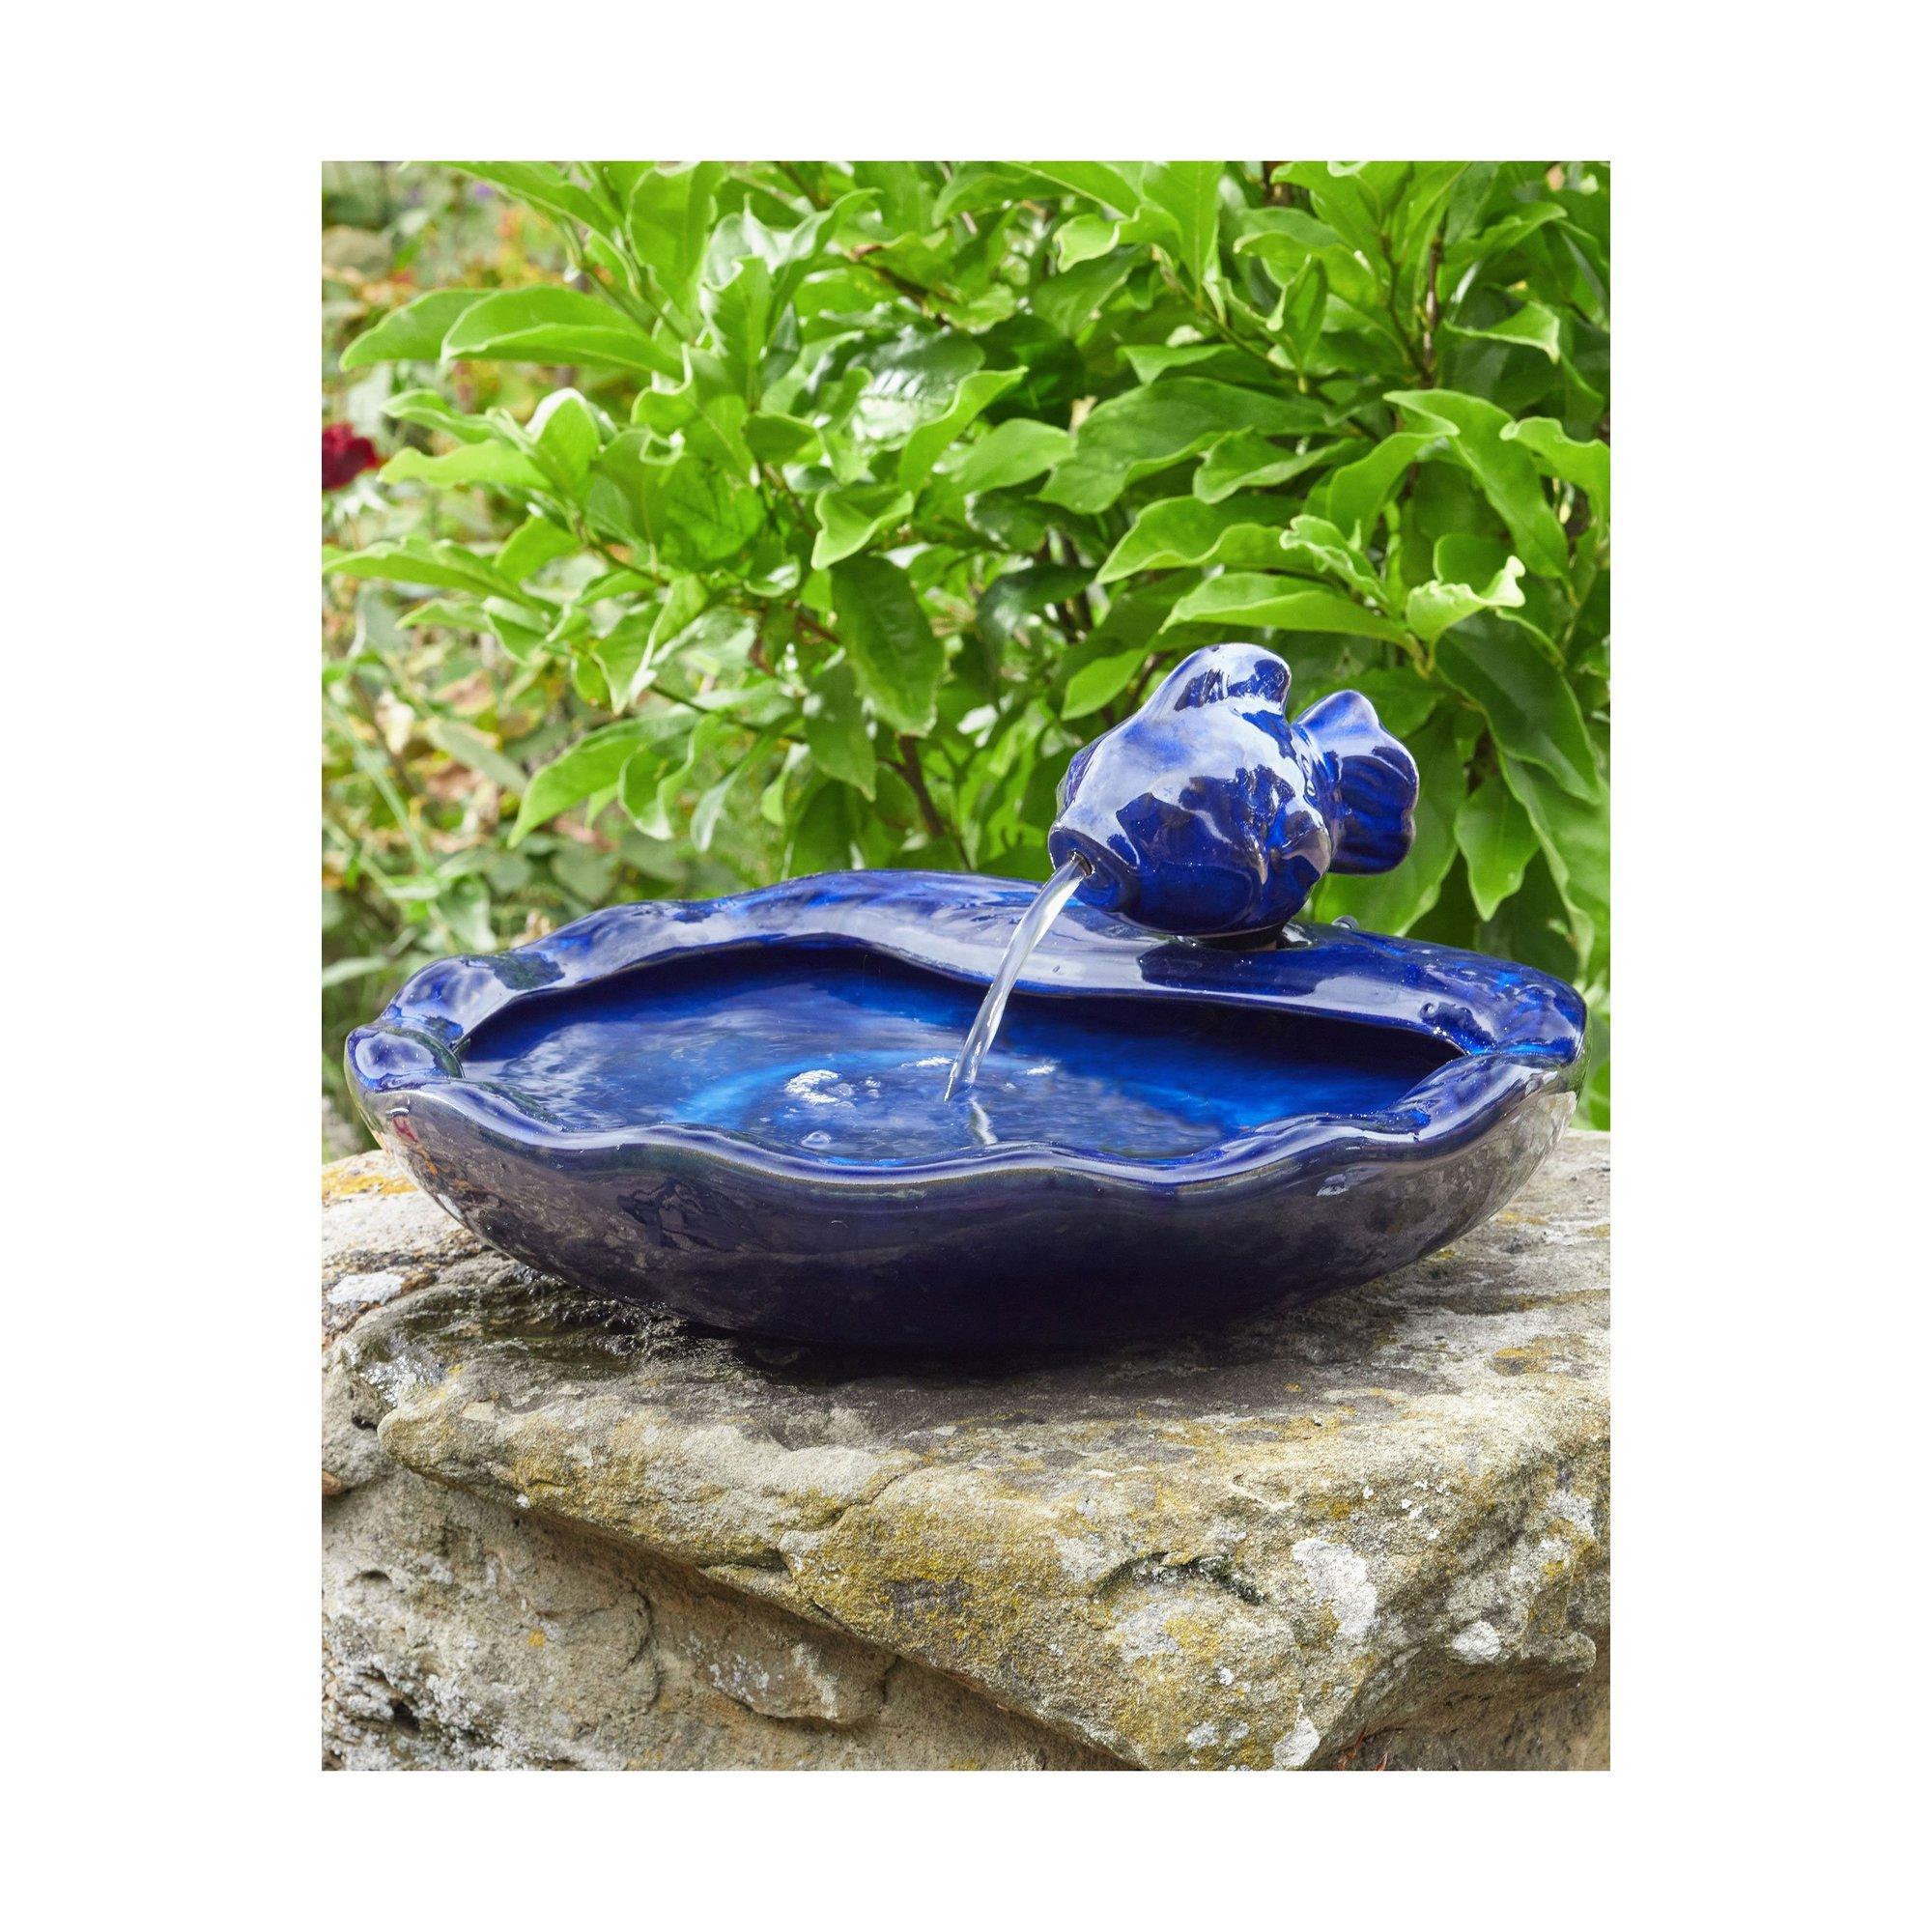 Image of Ceramic Fish Water Feature